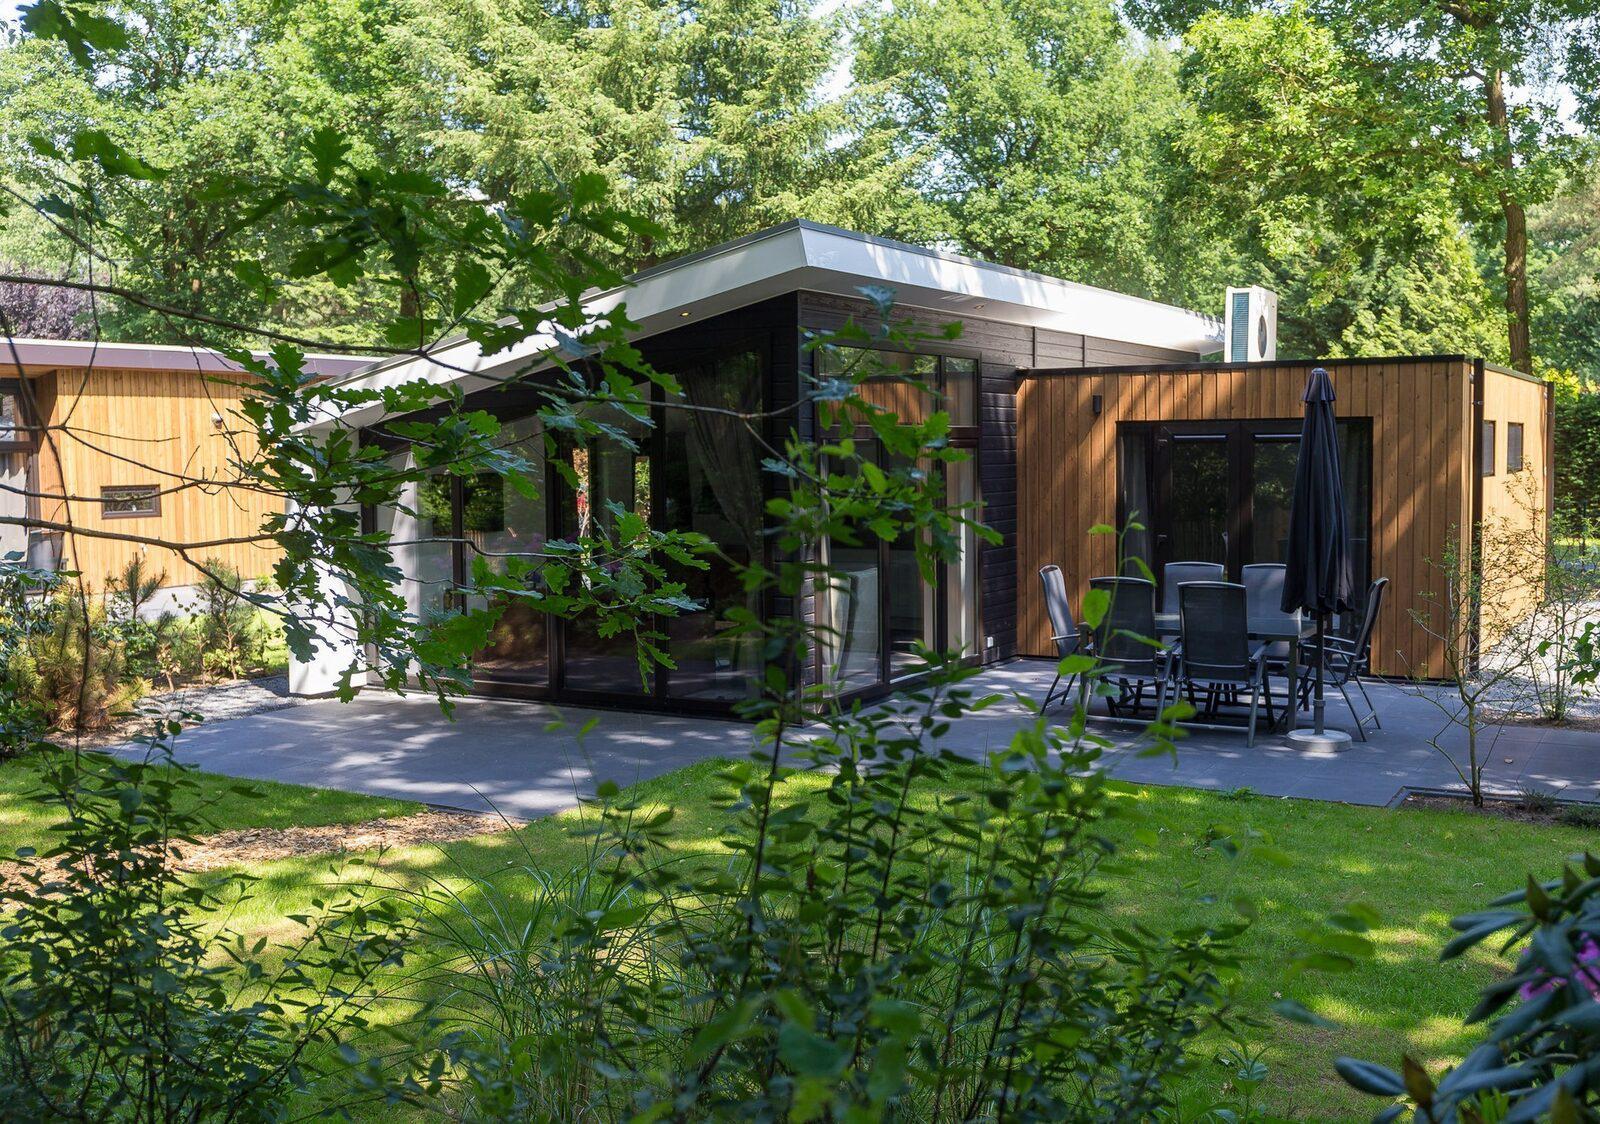 Bos Lodge 75 Eco 6 personen Wellness